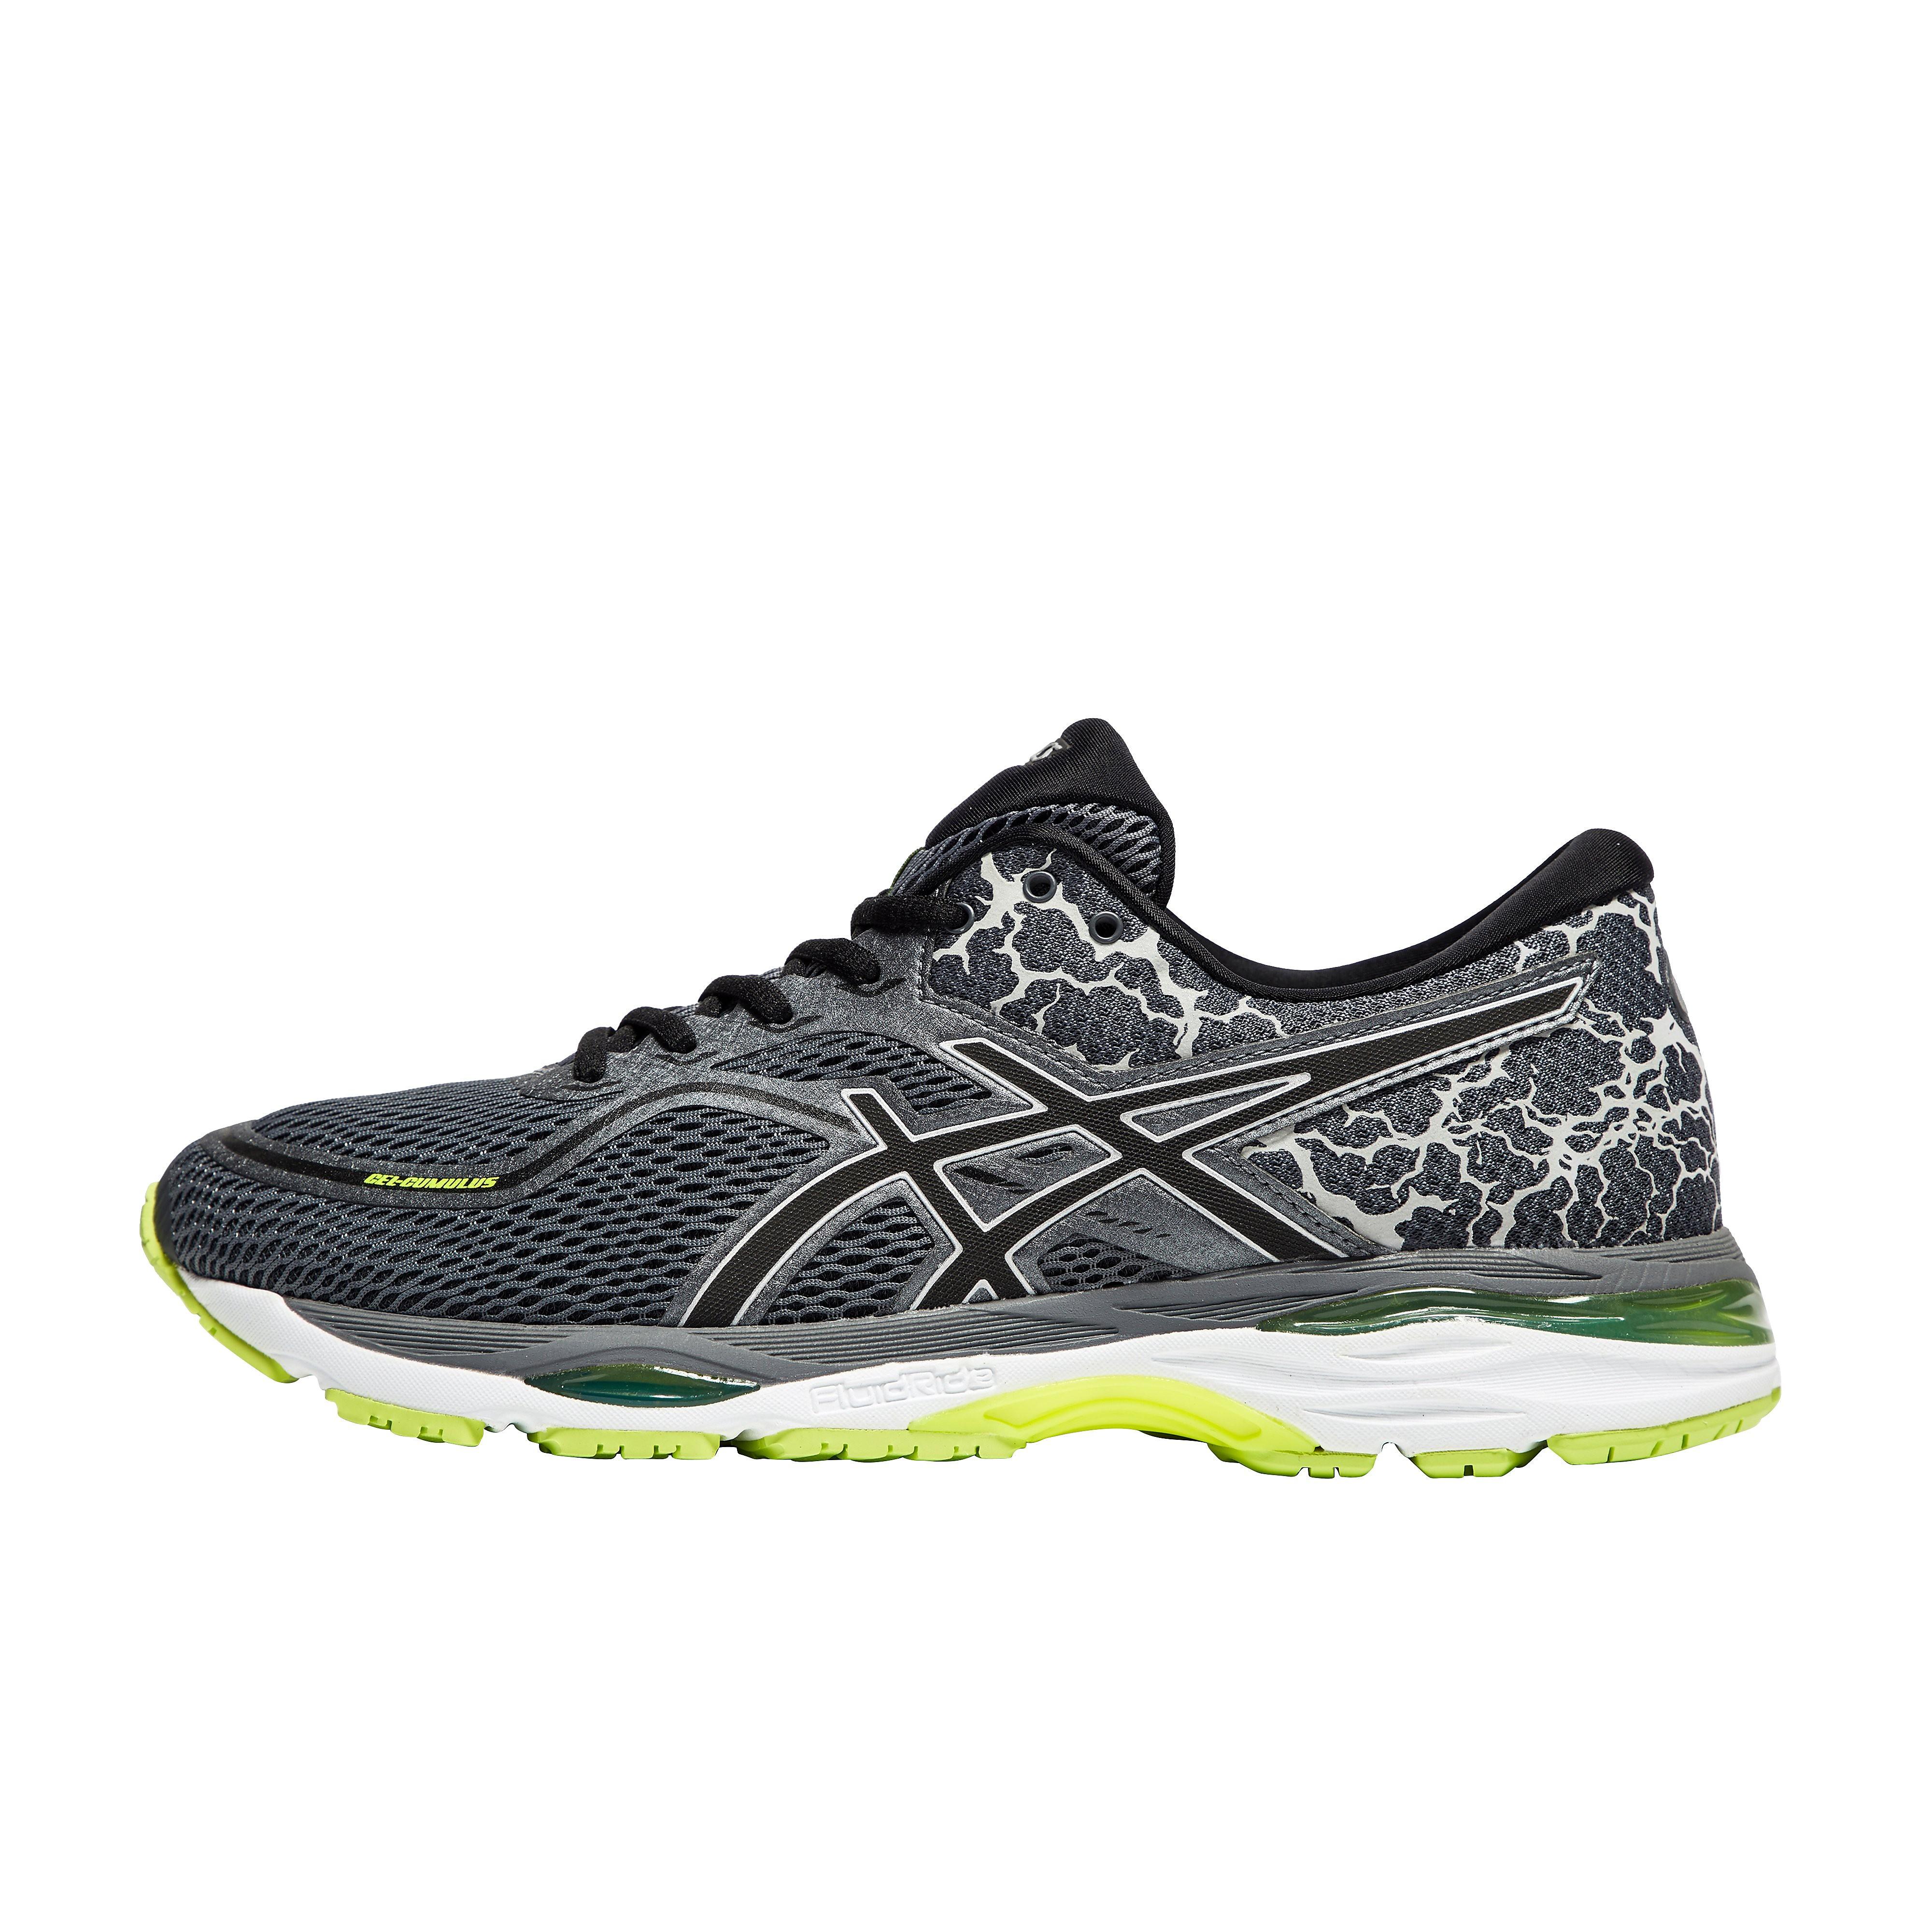 ASICS Gel-Cumulus 19 Lite-Show Men's Running Shoes